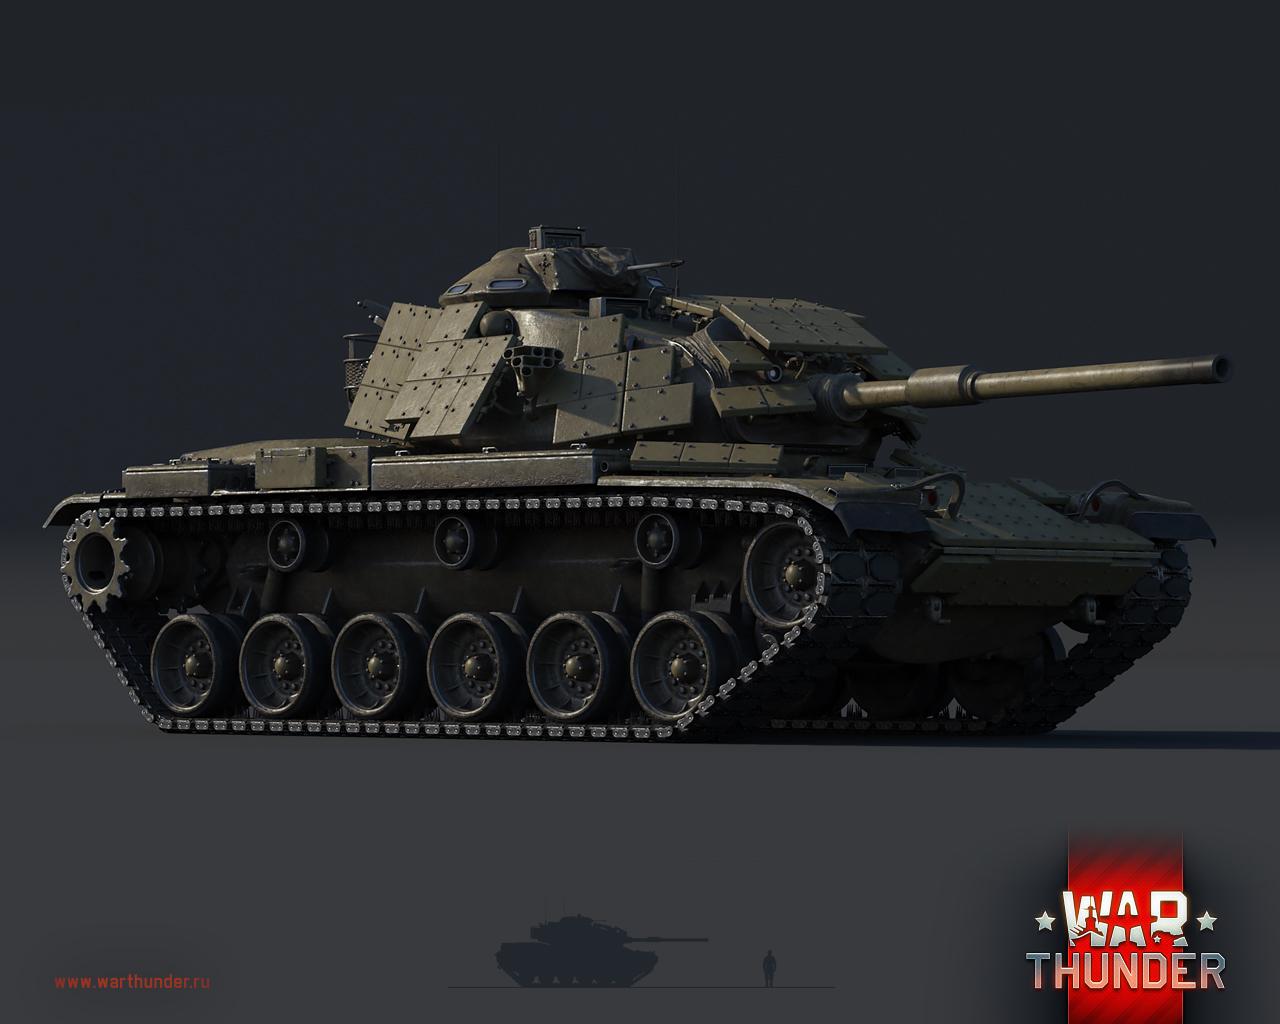 https://static.warthunder.ru/upload/image/2017/August/DB/m6a1_era_1280x1024_logo_ru_93475165ca6a1361b4f2ab4a5a048cf2.jpg